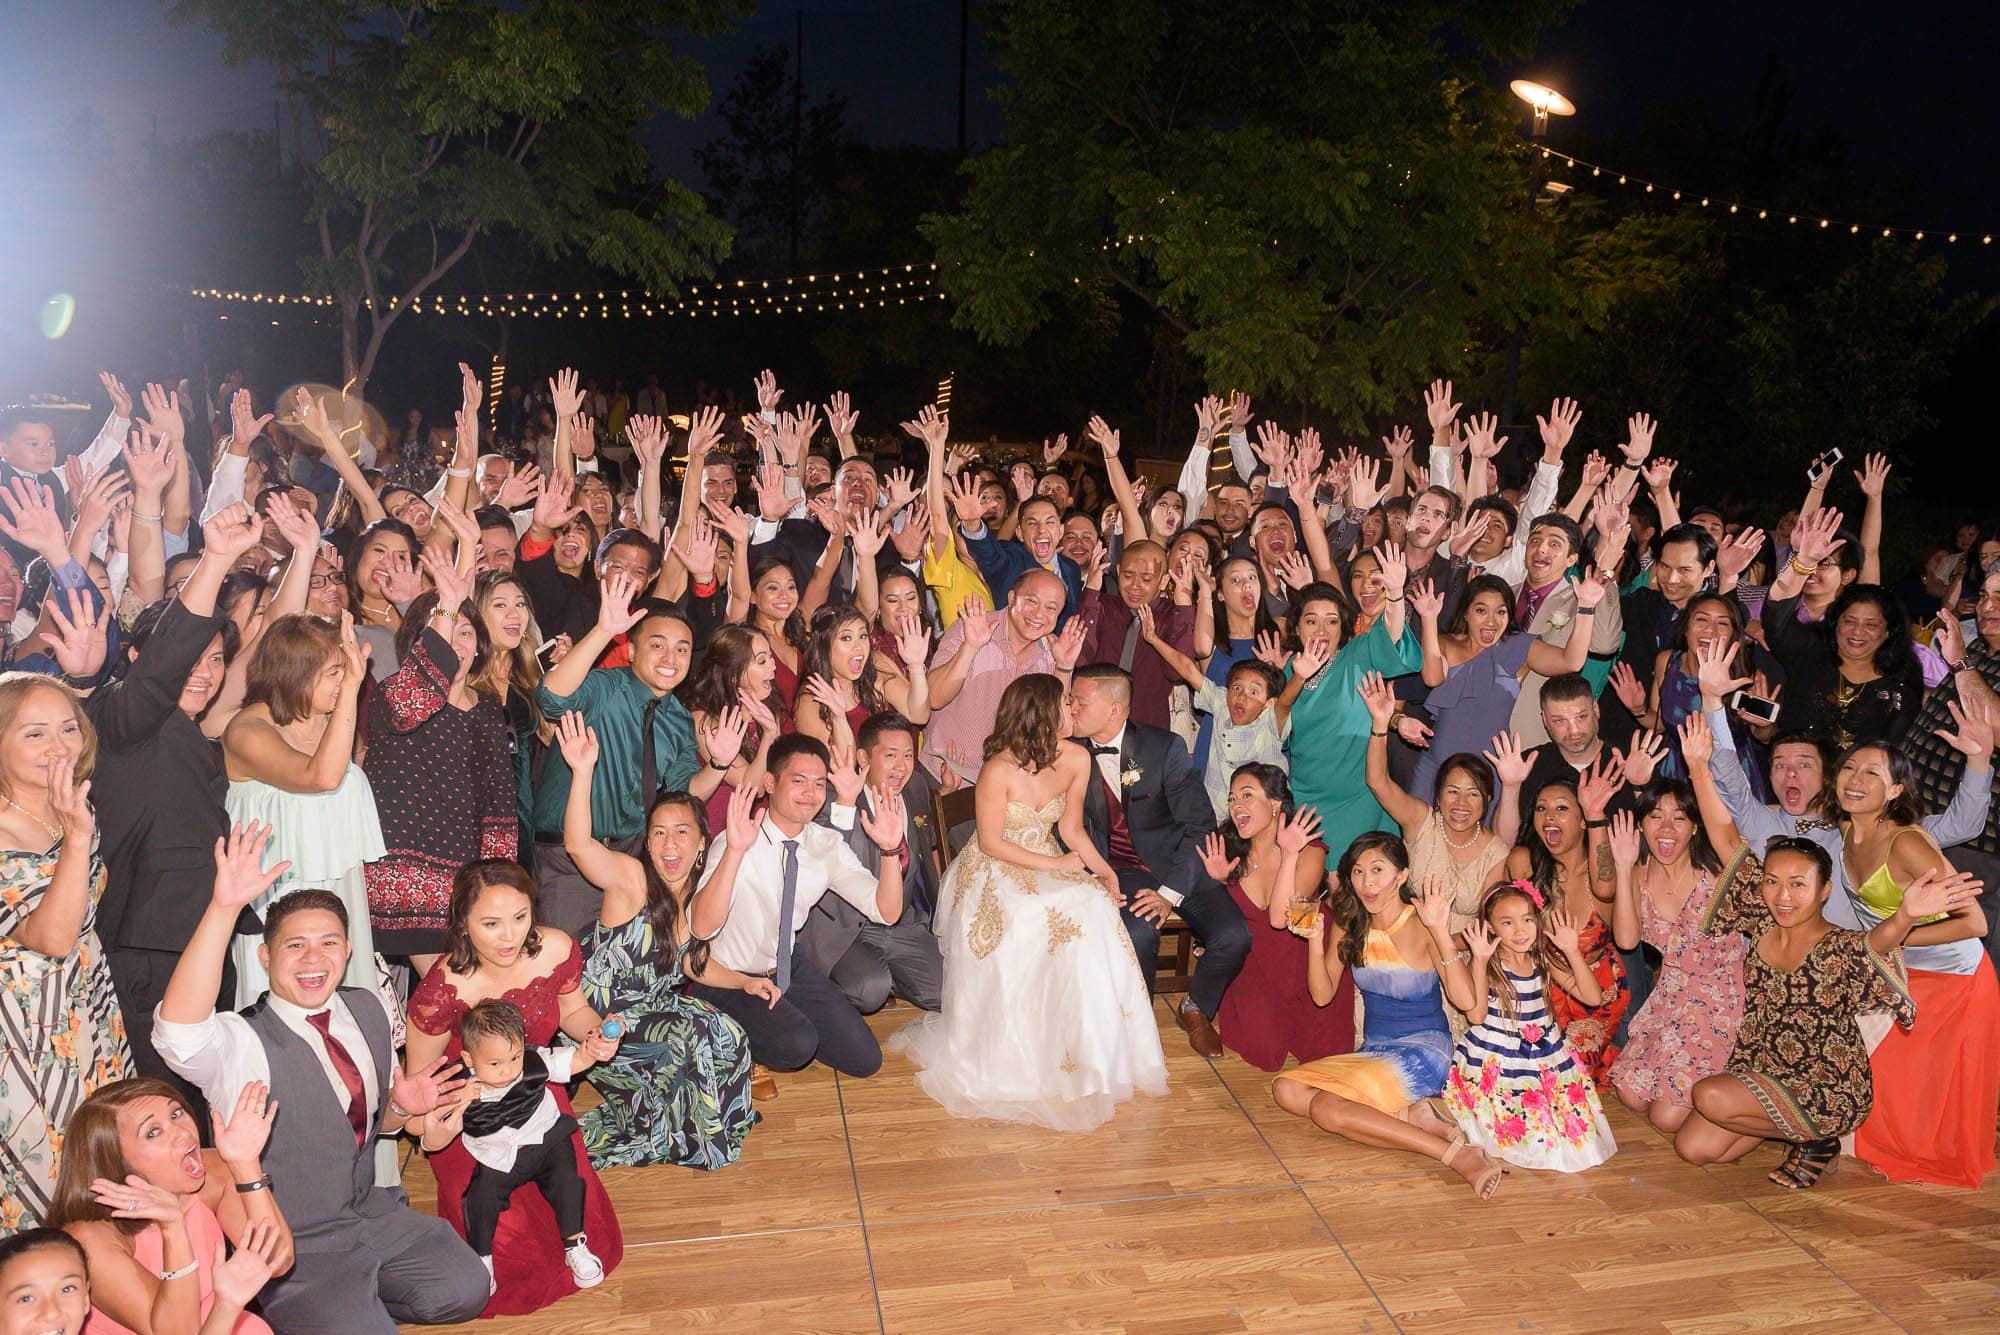 046_Alan_and_Heidi_Wedding_Karla_Paolo